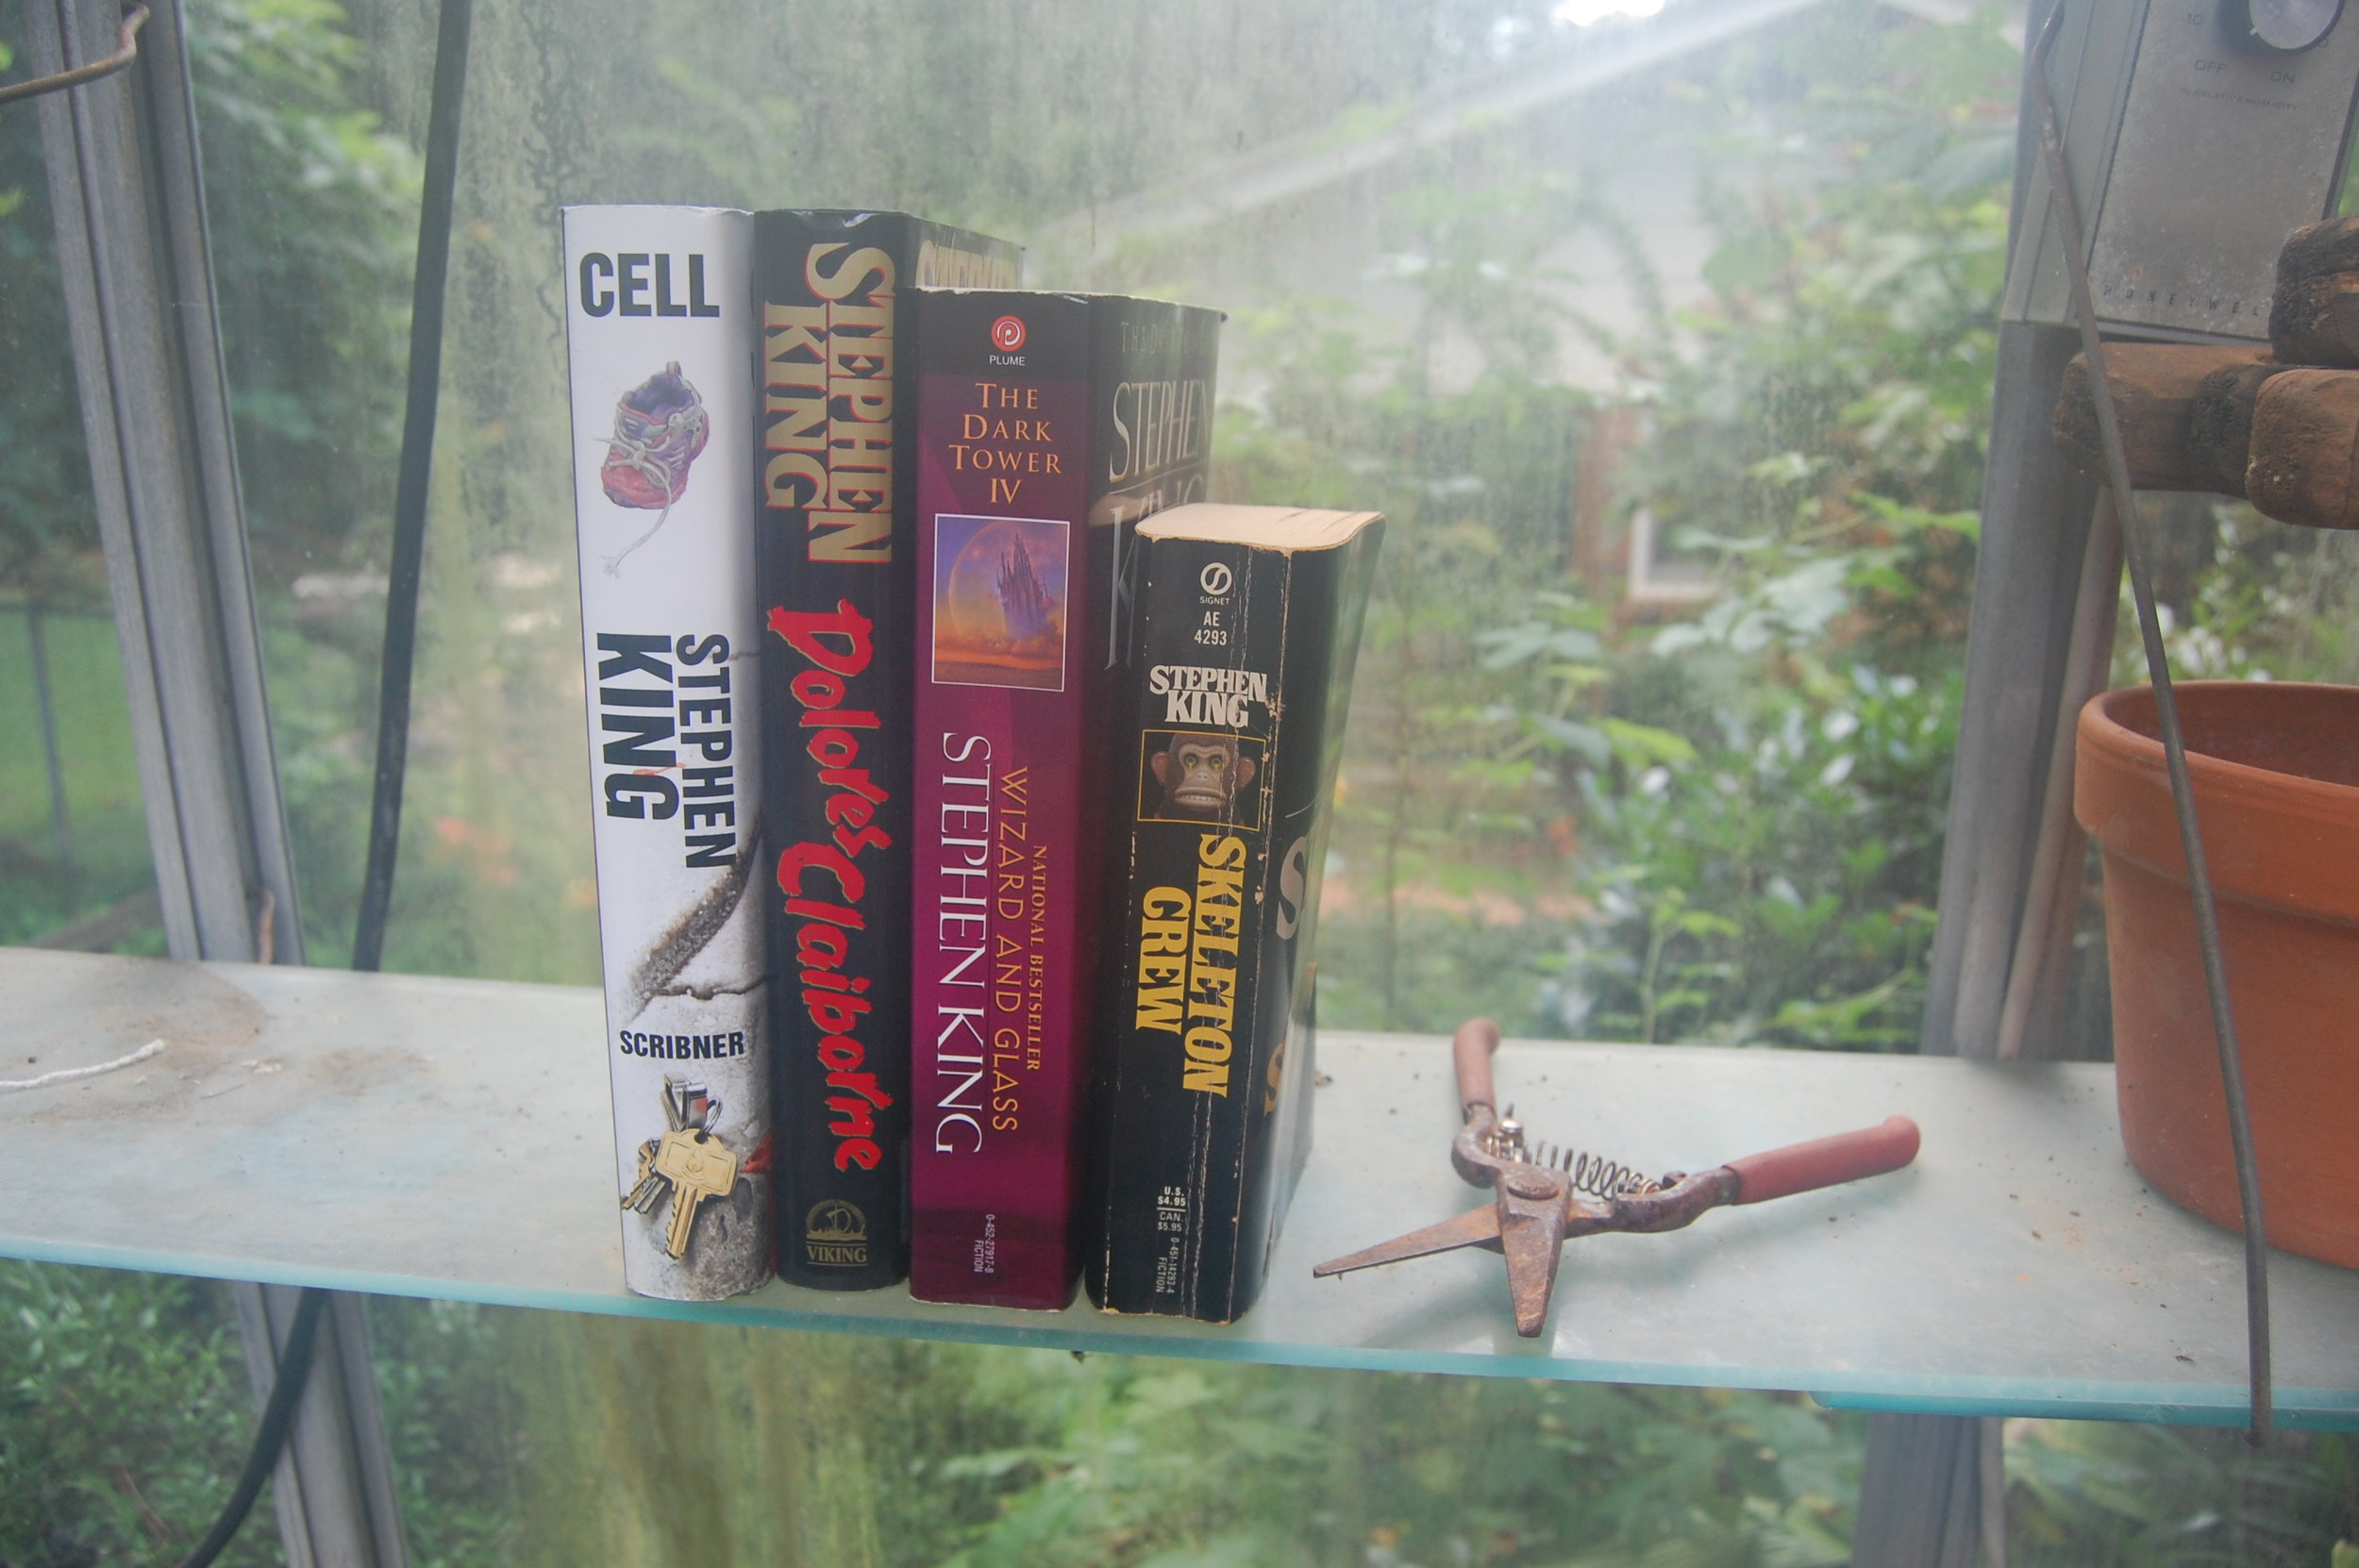 Stephen King Book Shelfie Vertical 2